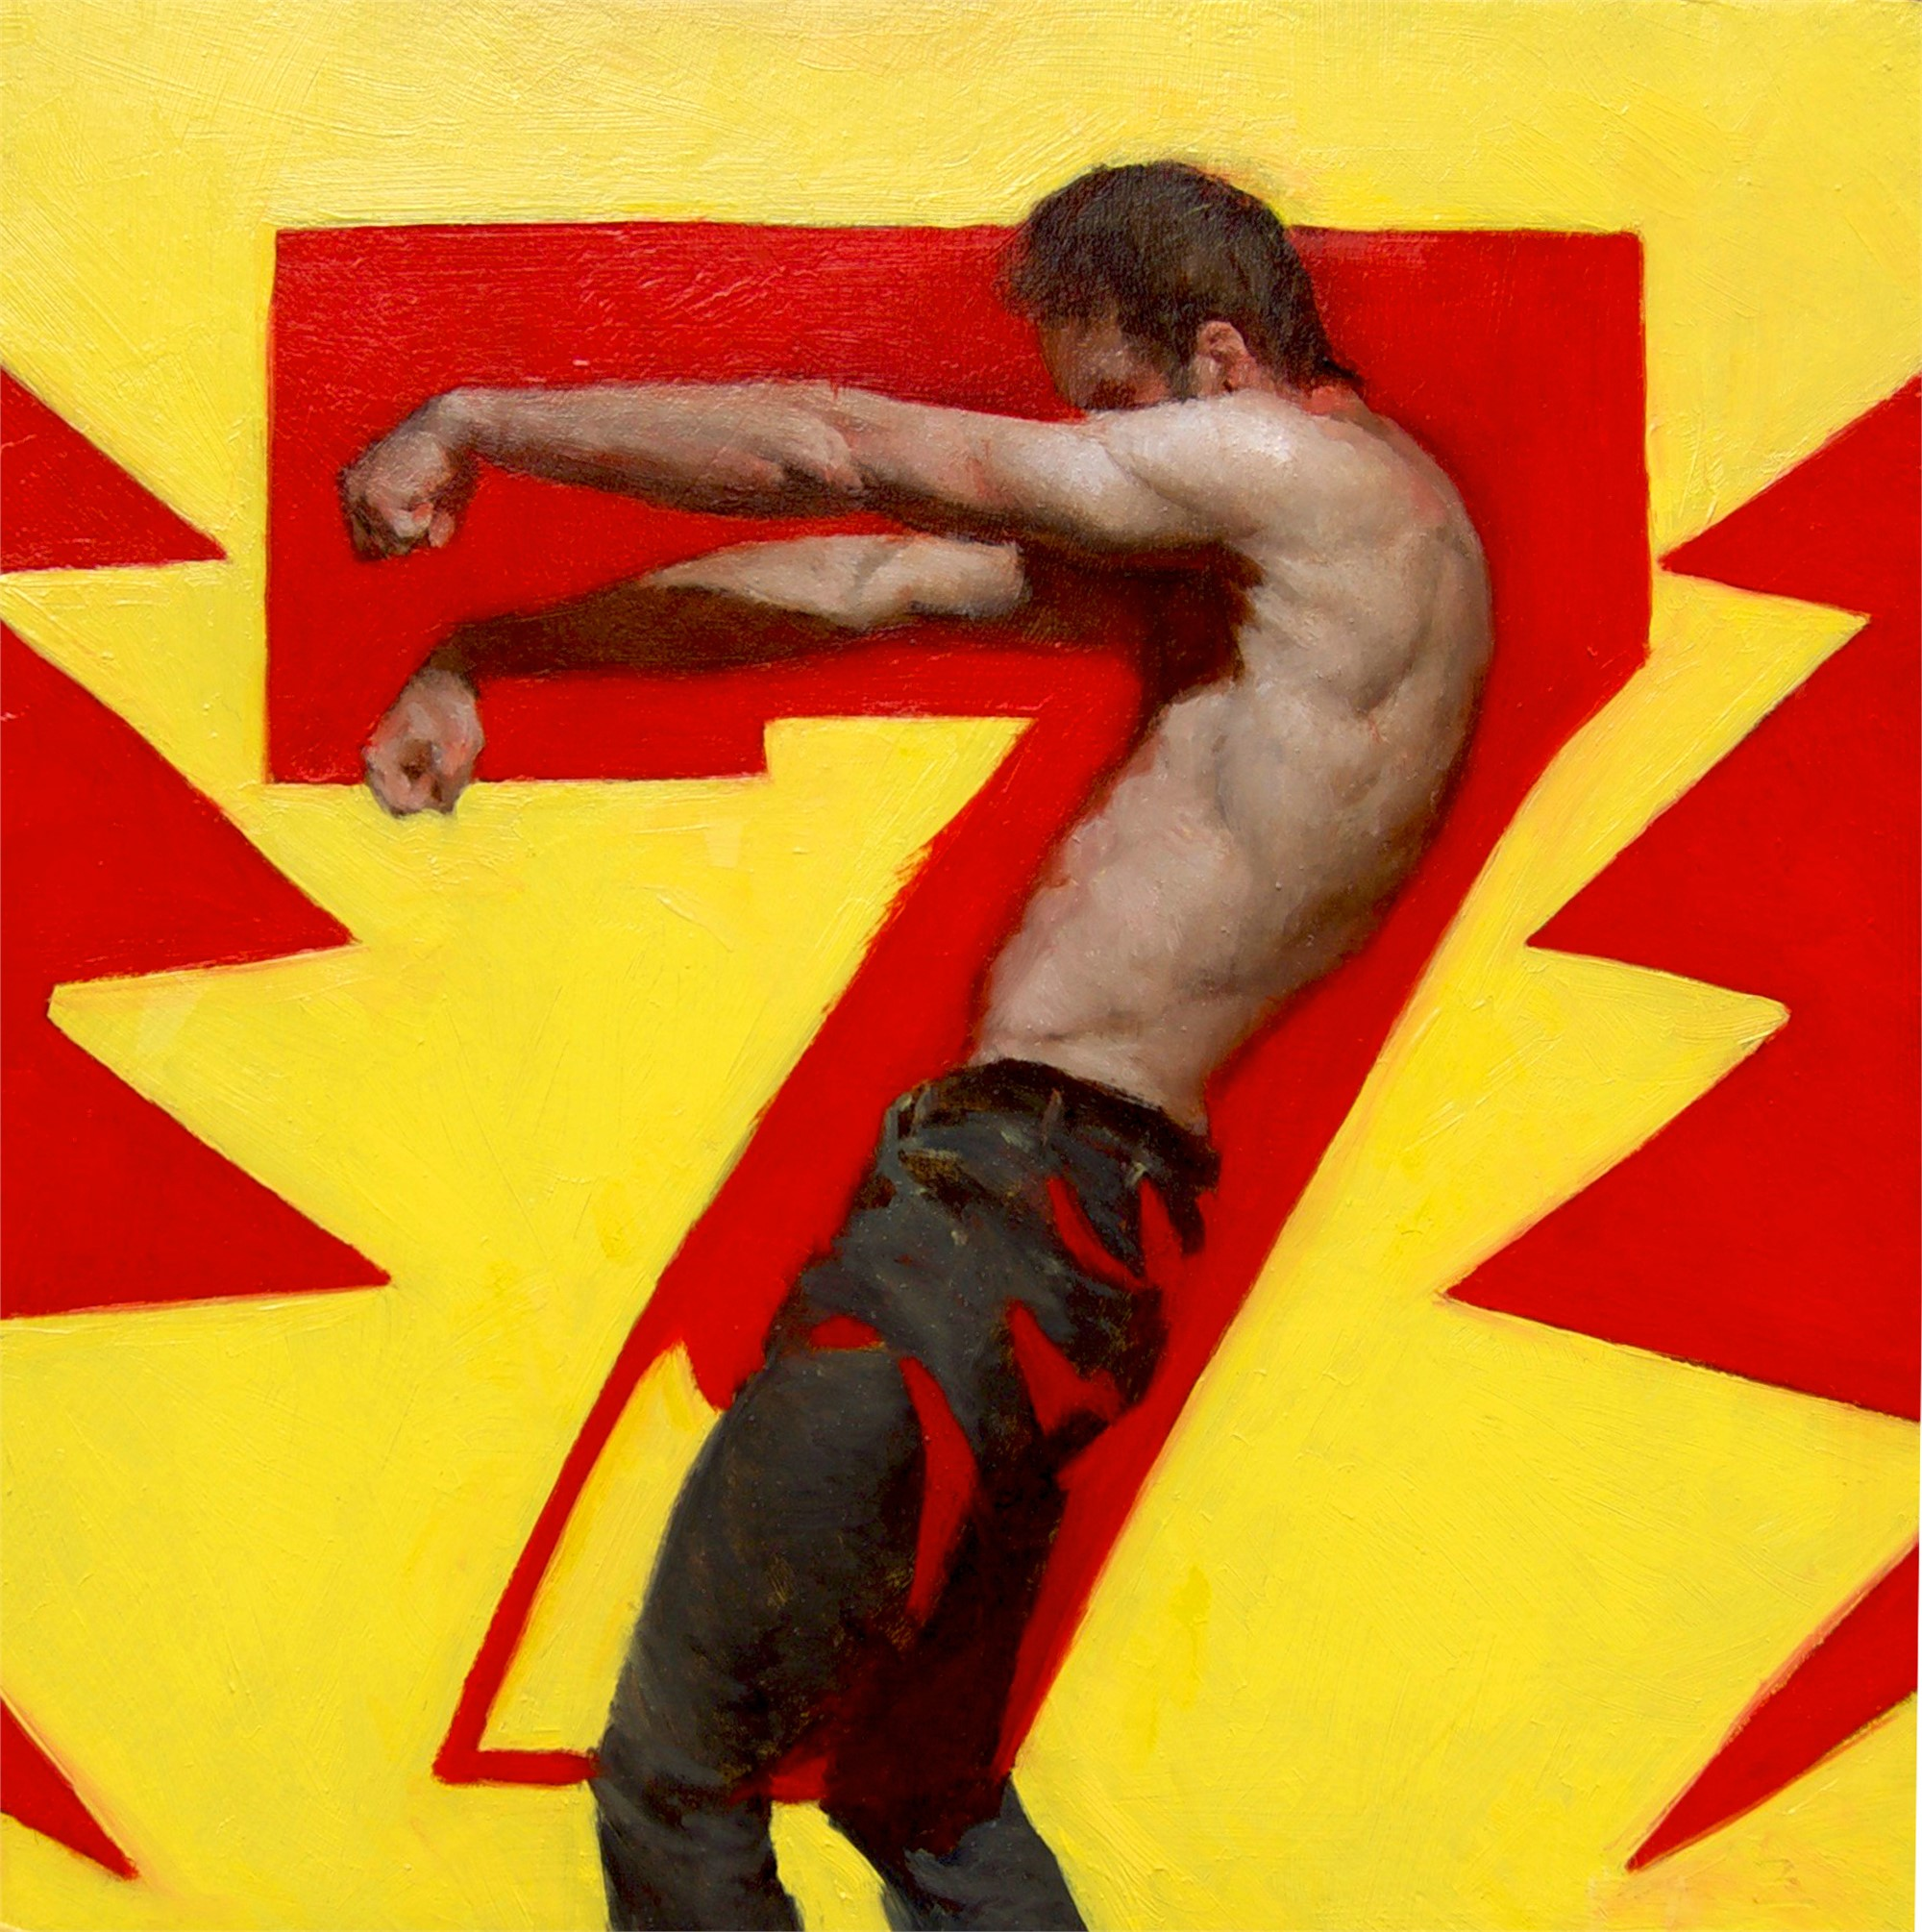 Seven by Zack Zdrale